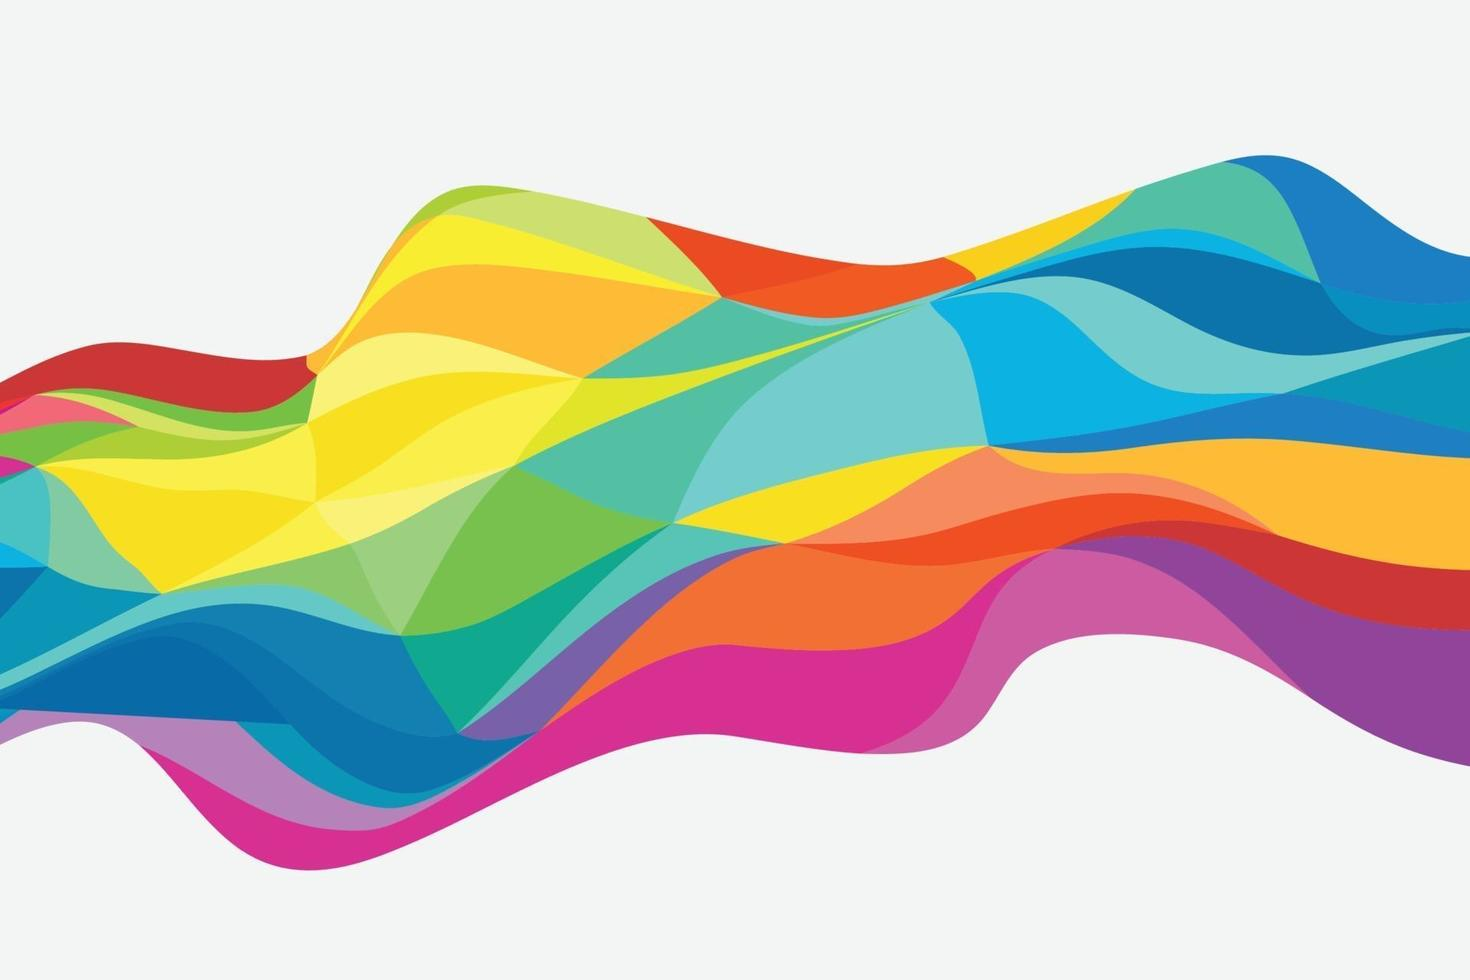 Abstract color polygon design pattern artwork background. illustration vector eps10